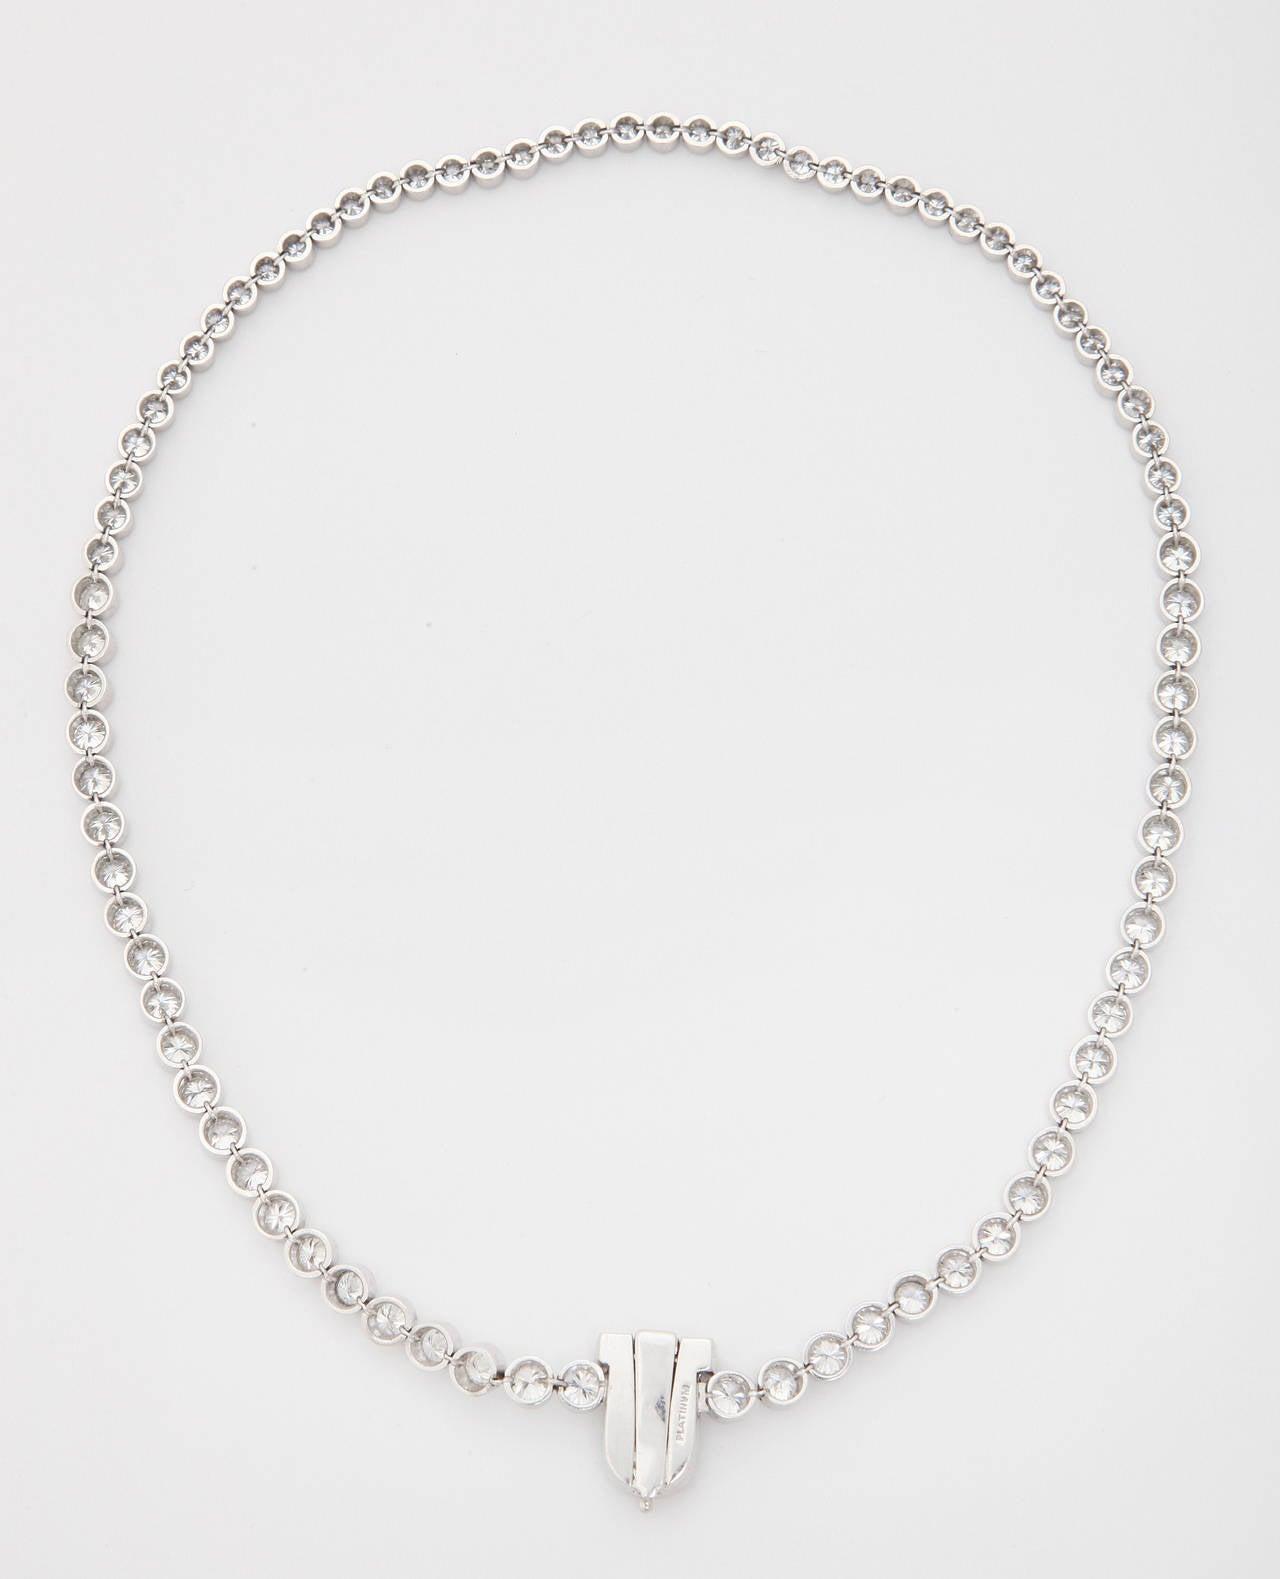 Diamond Platinum Riviere Necklace with Baguette Cut Diamond Clasp For Sale 2